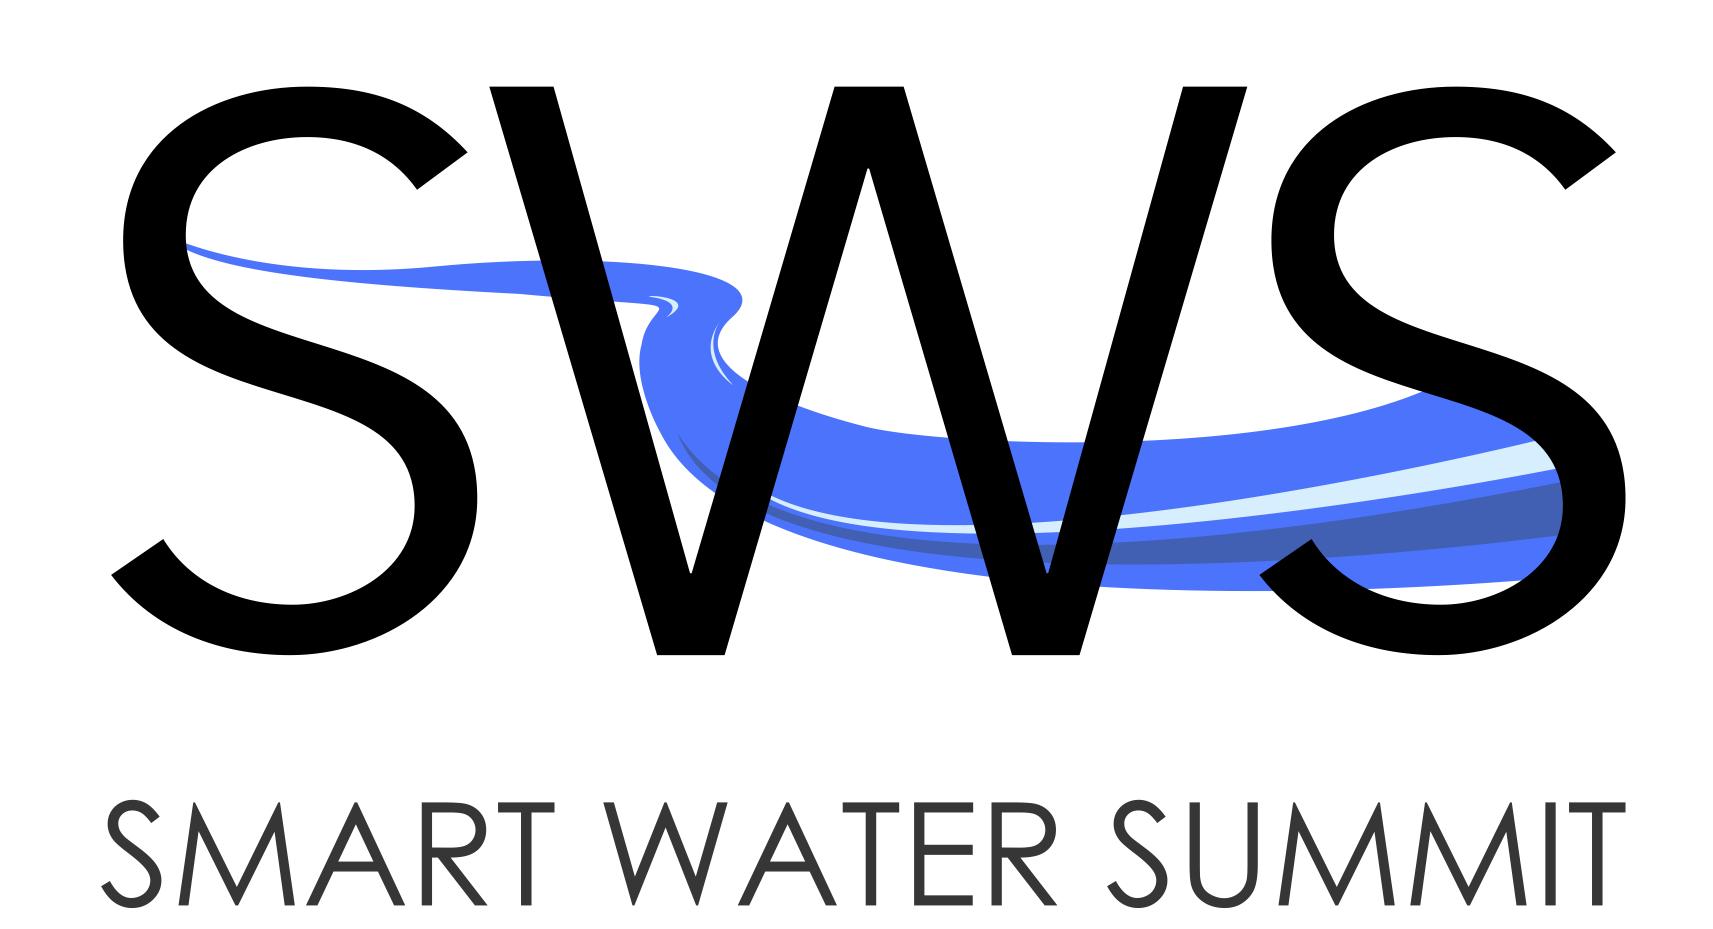 sws_logo_final.png